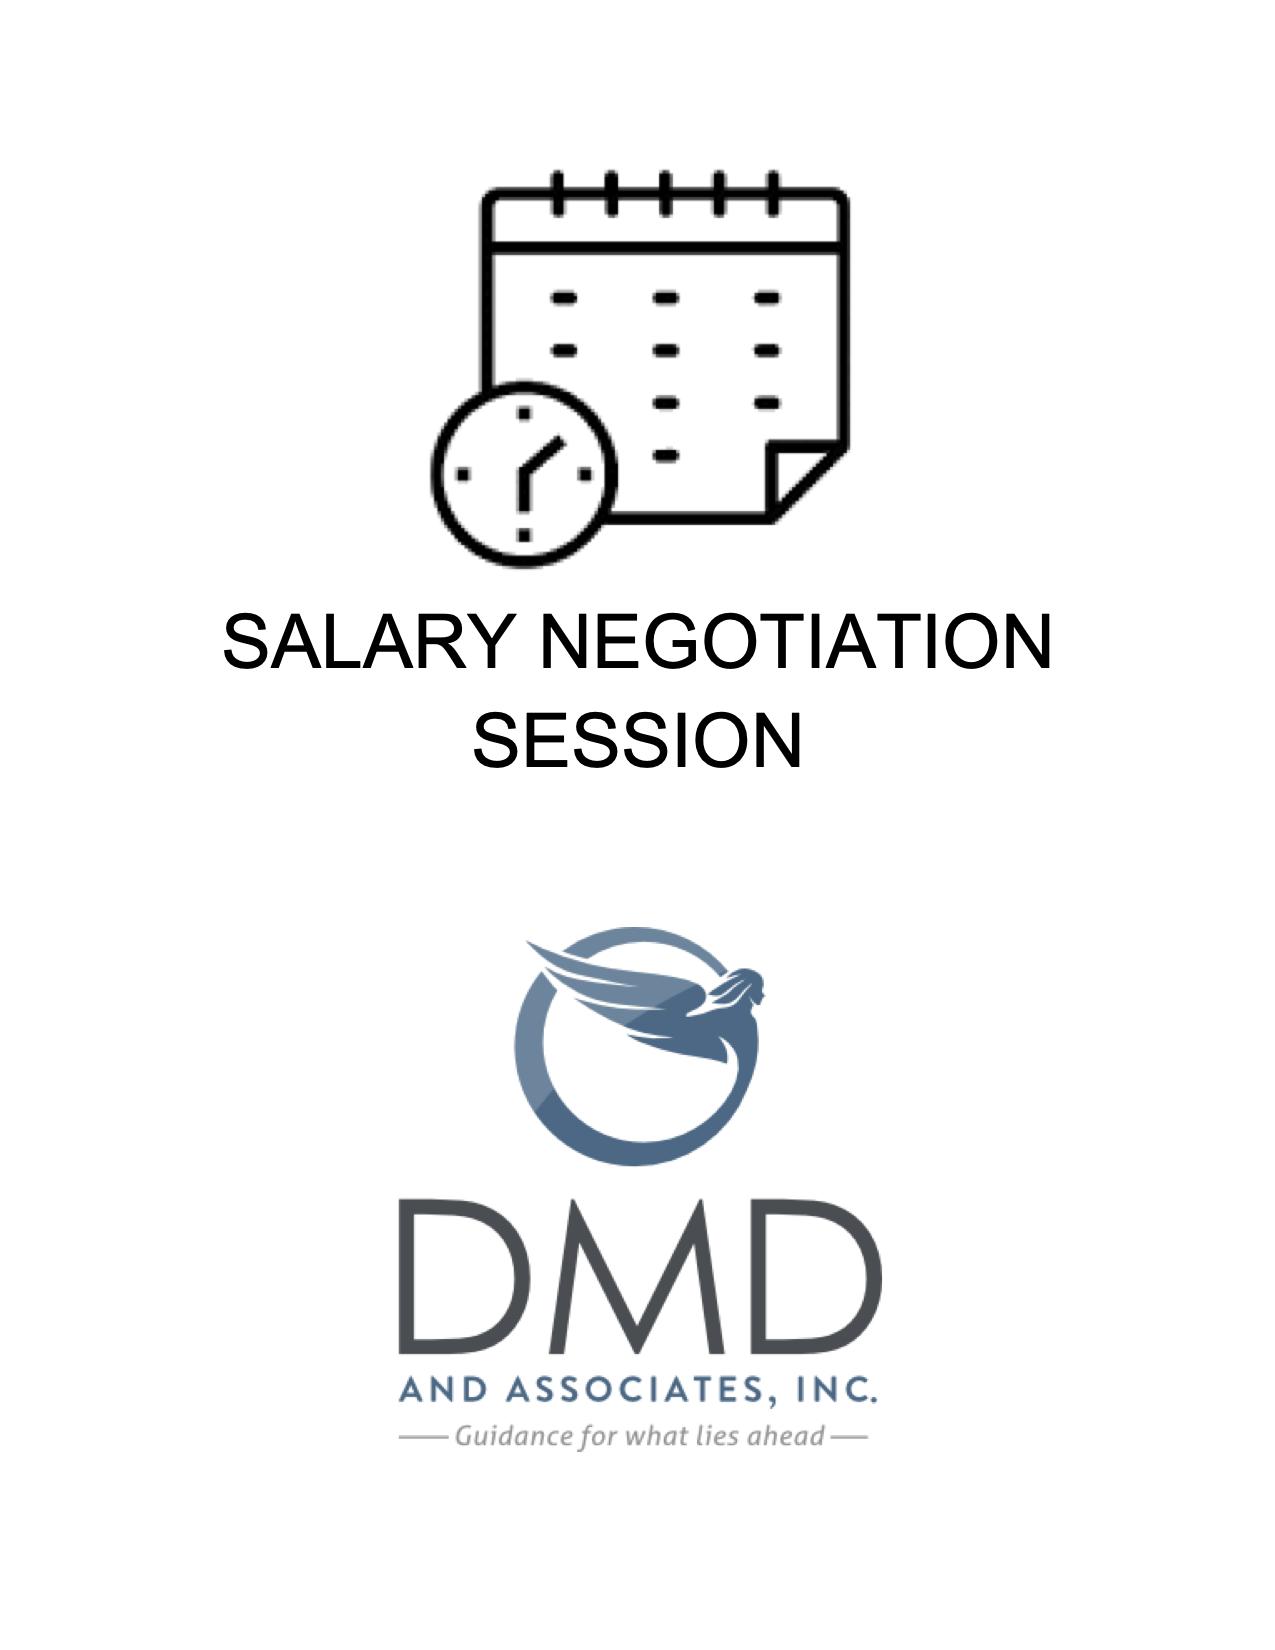 SalaryNegotiation.png